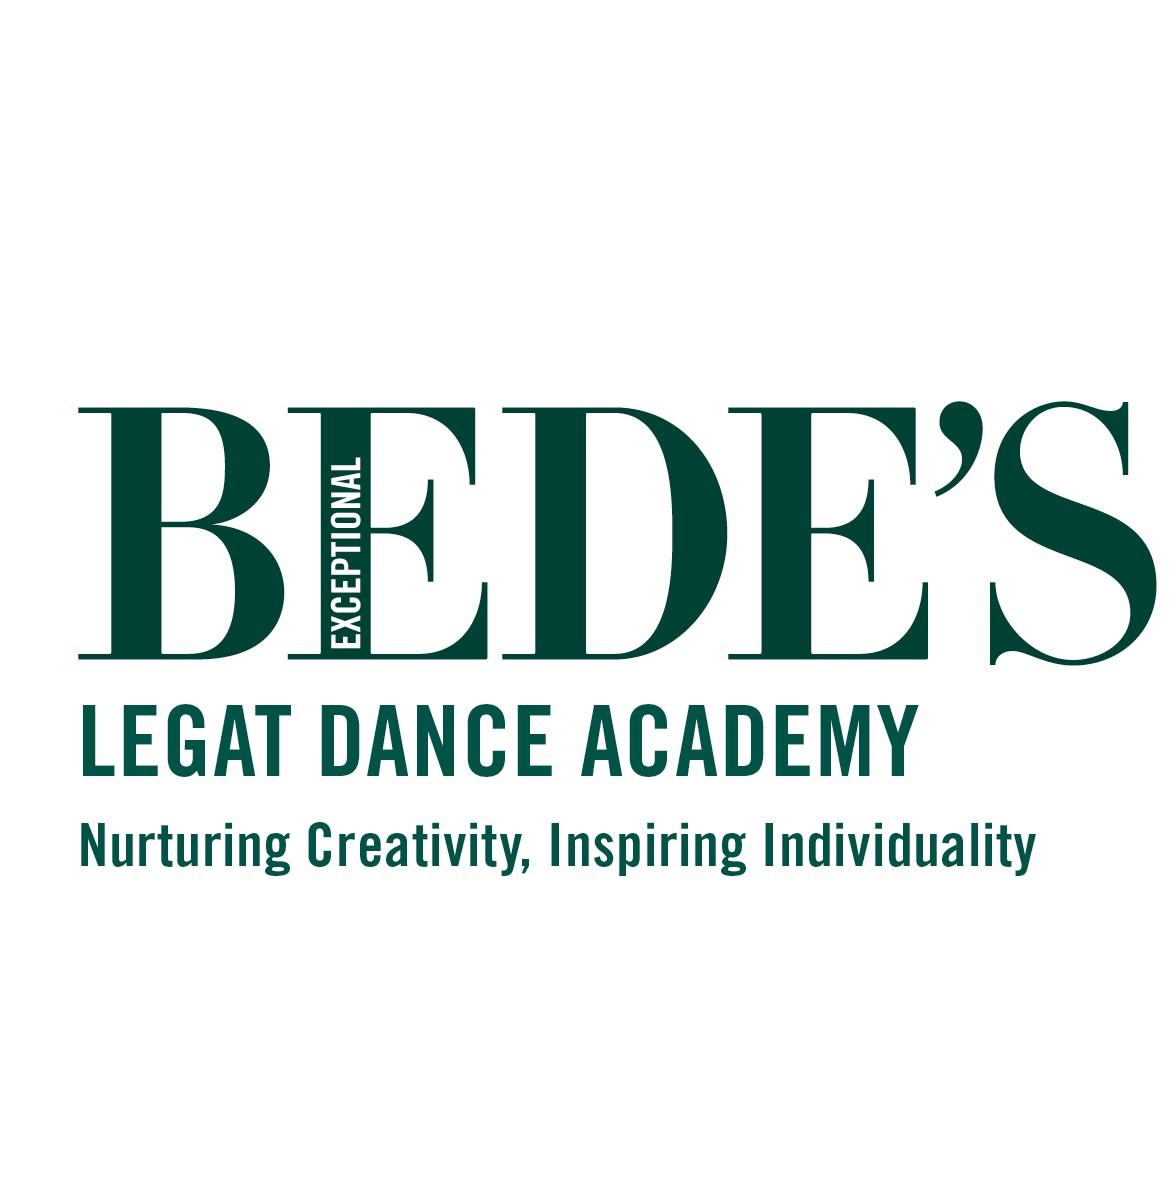 Legat Dance Academy